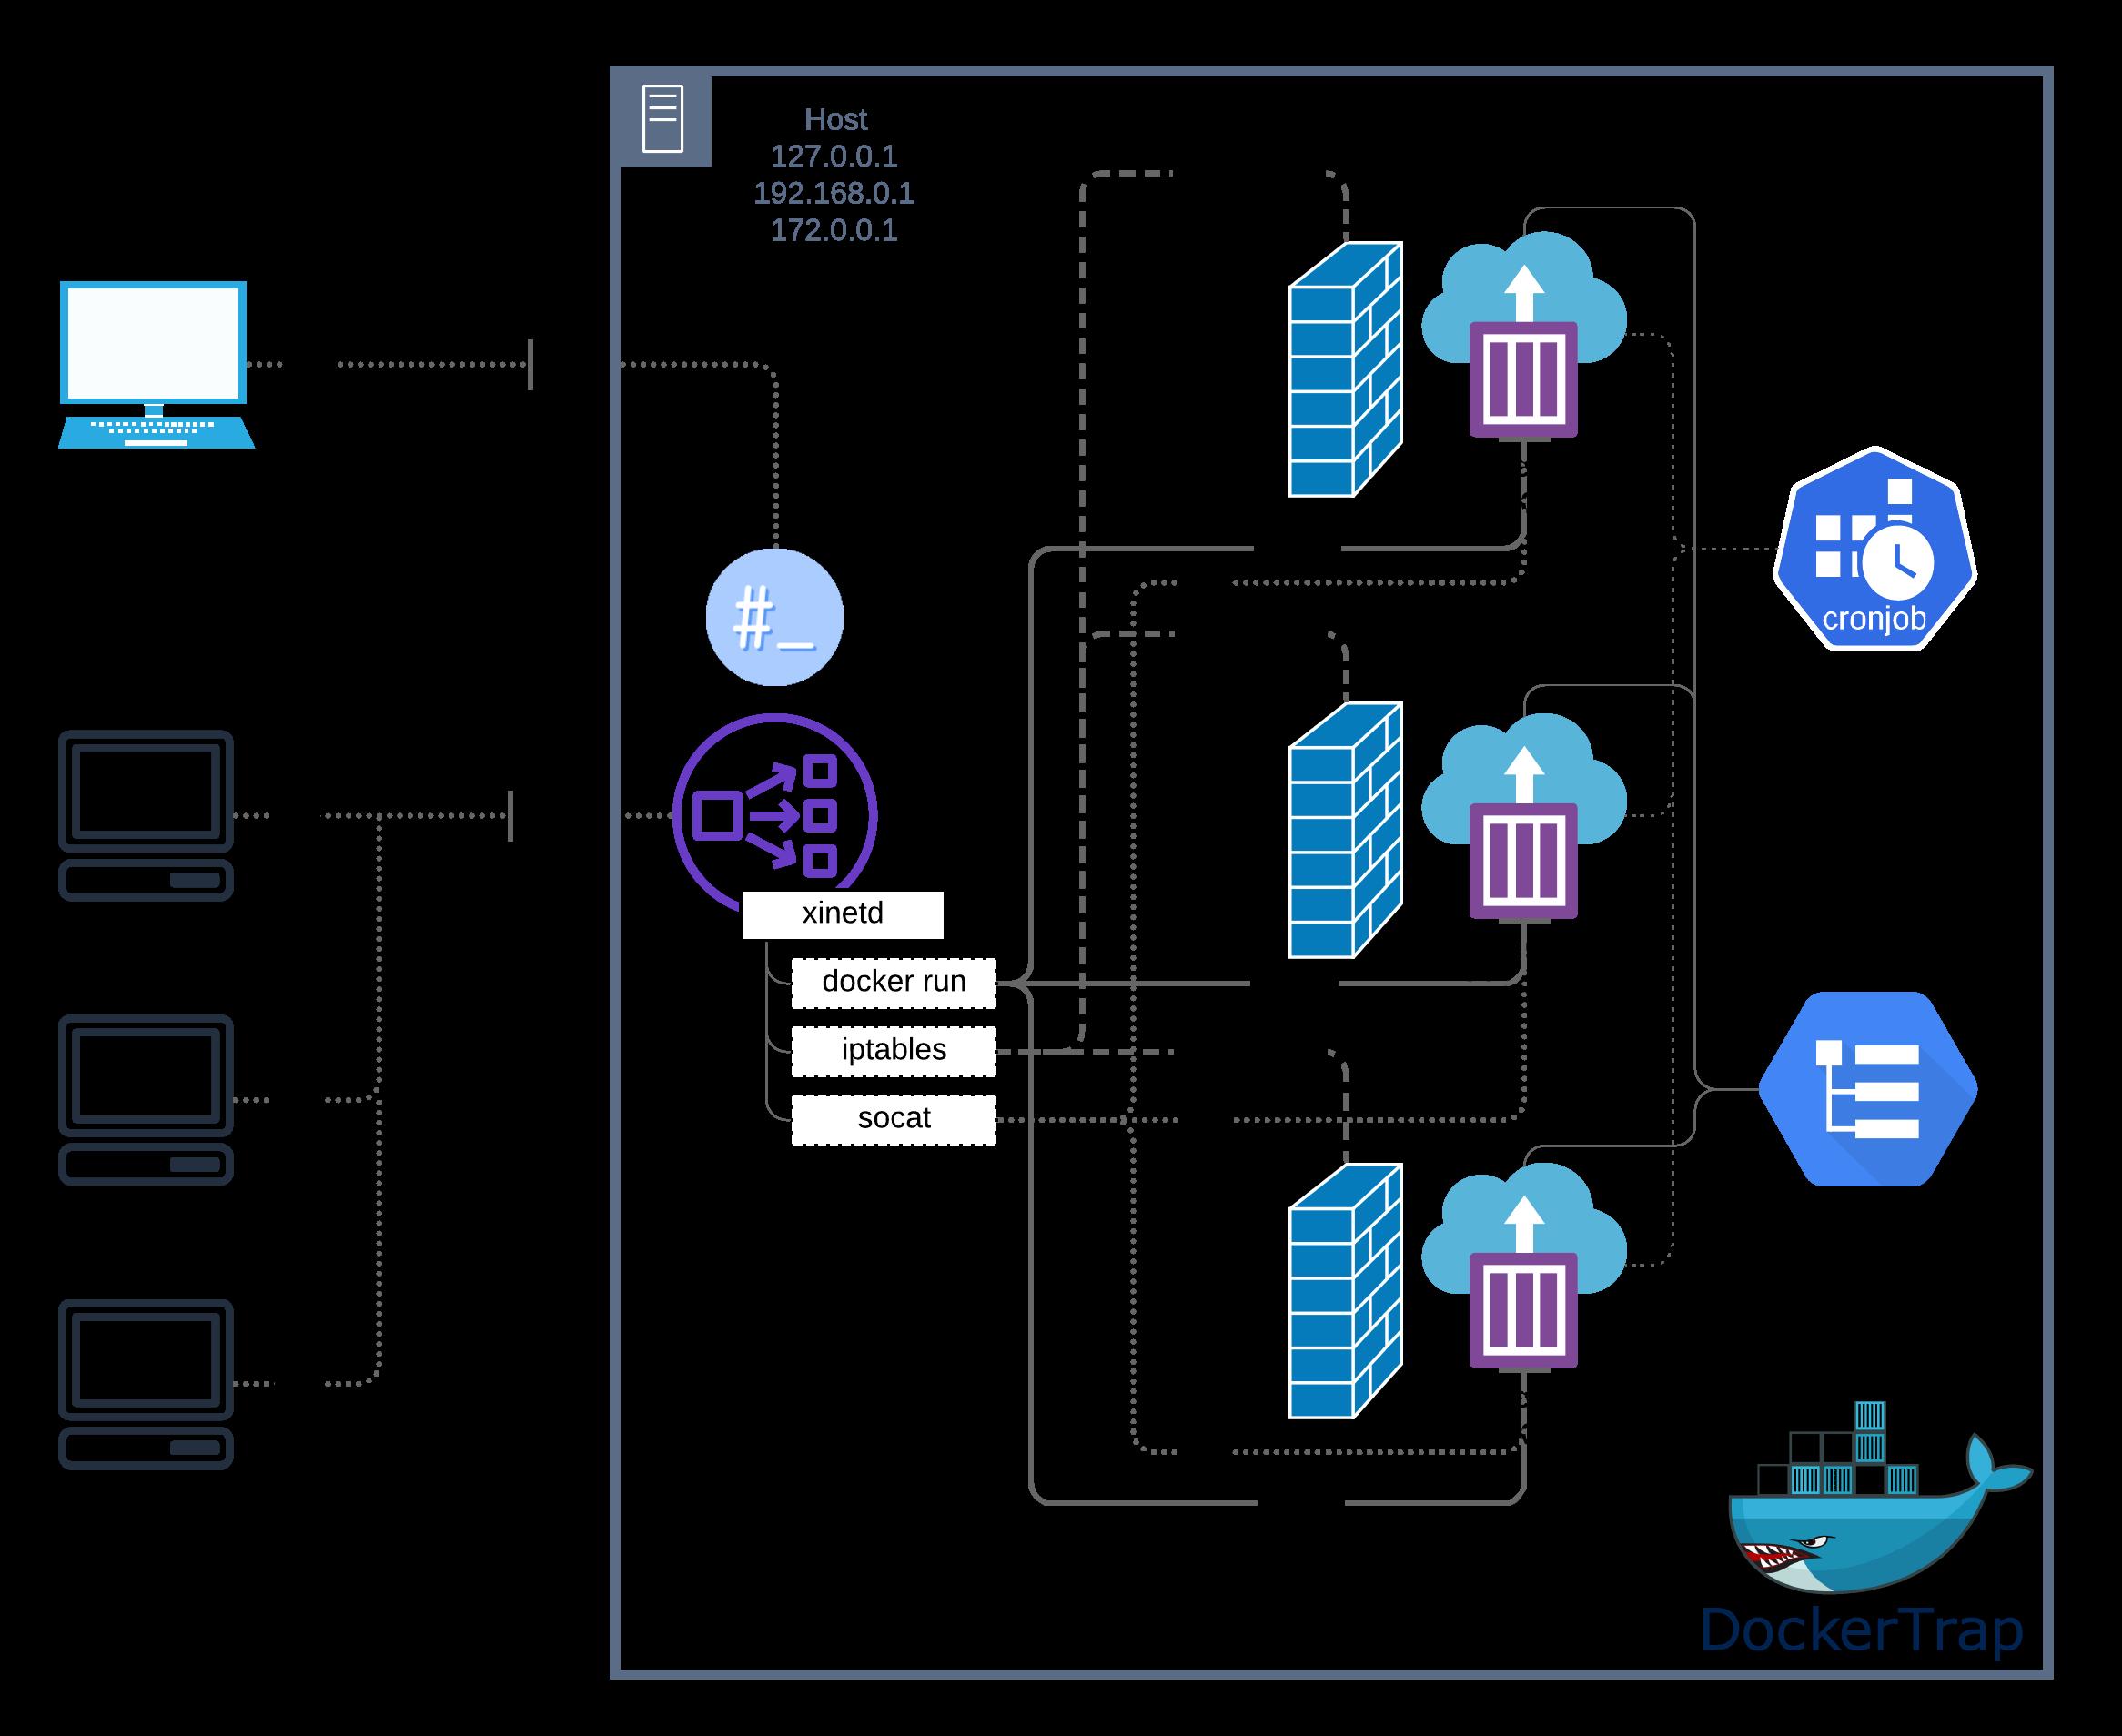 DockerTrap-System-Diagram-1